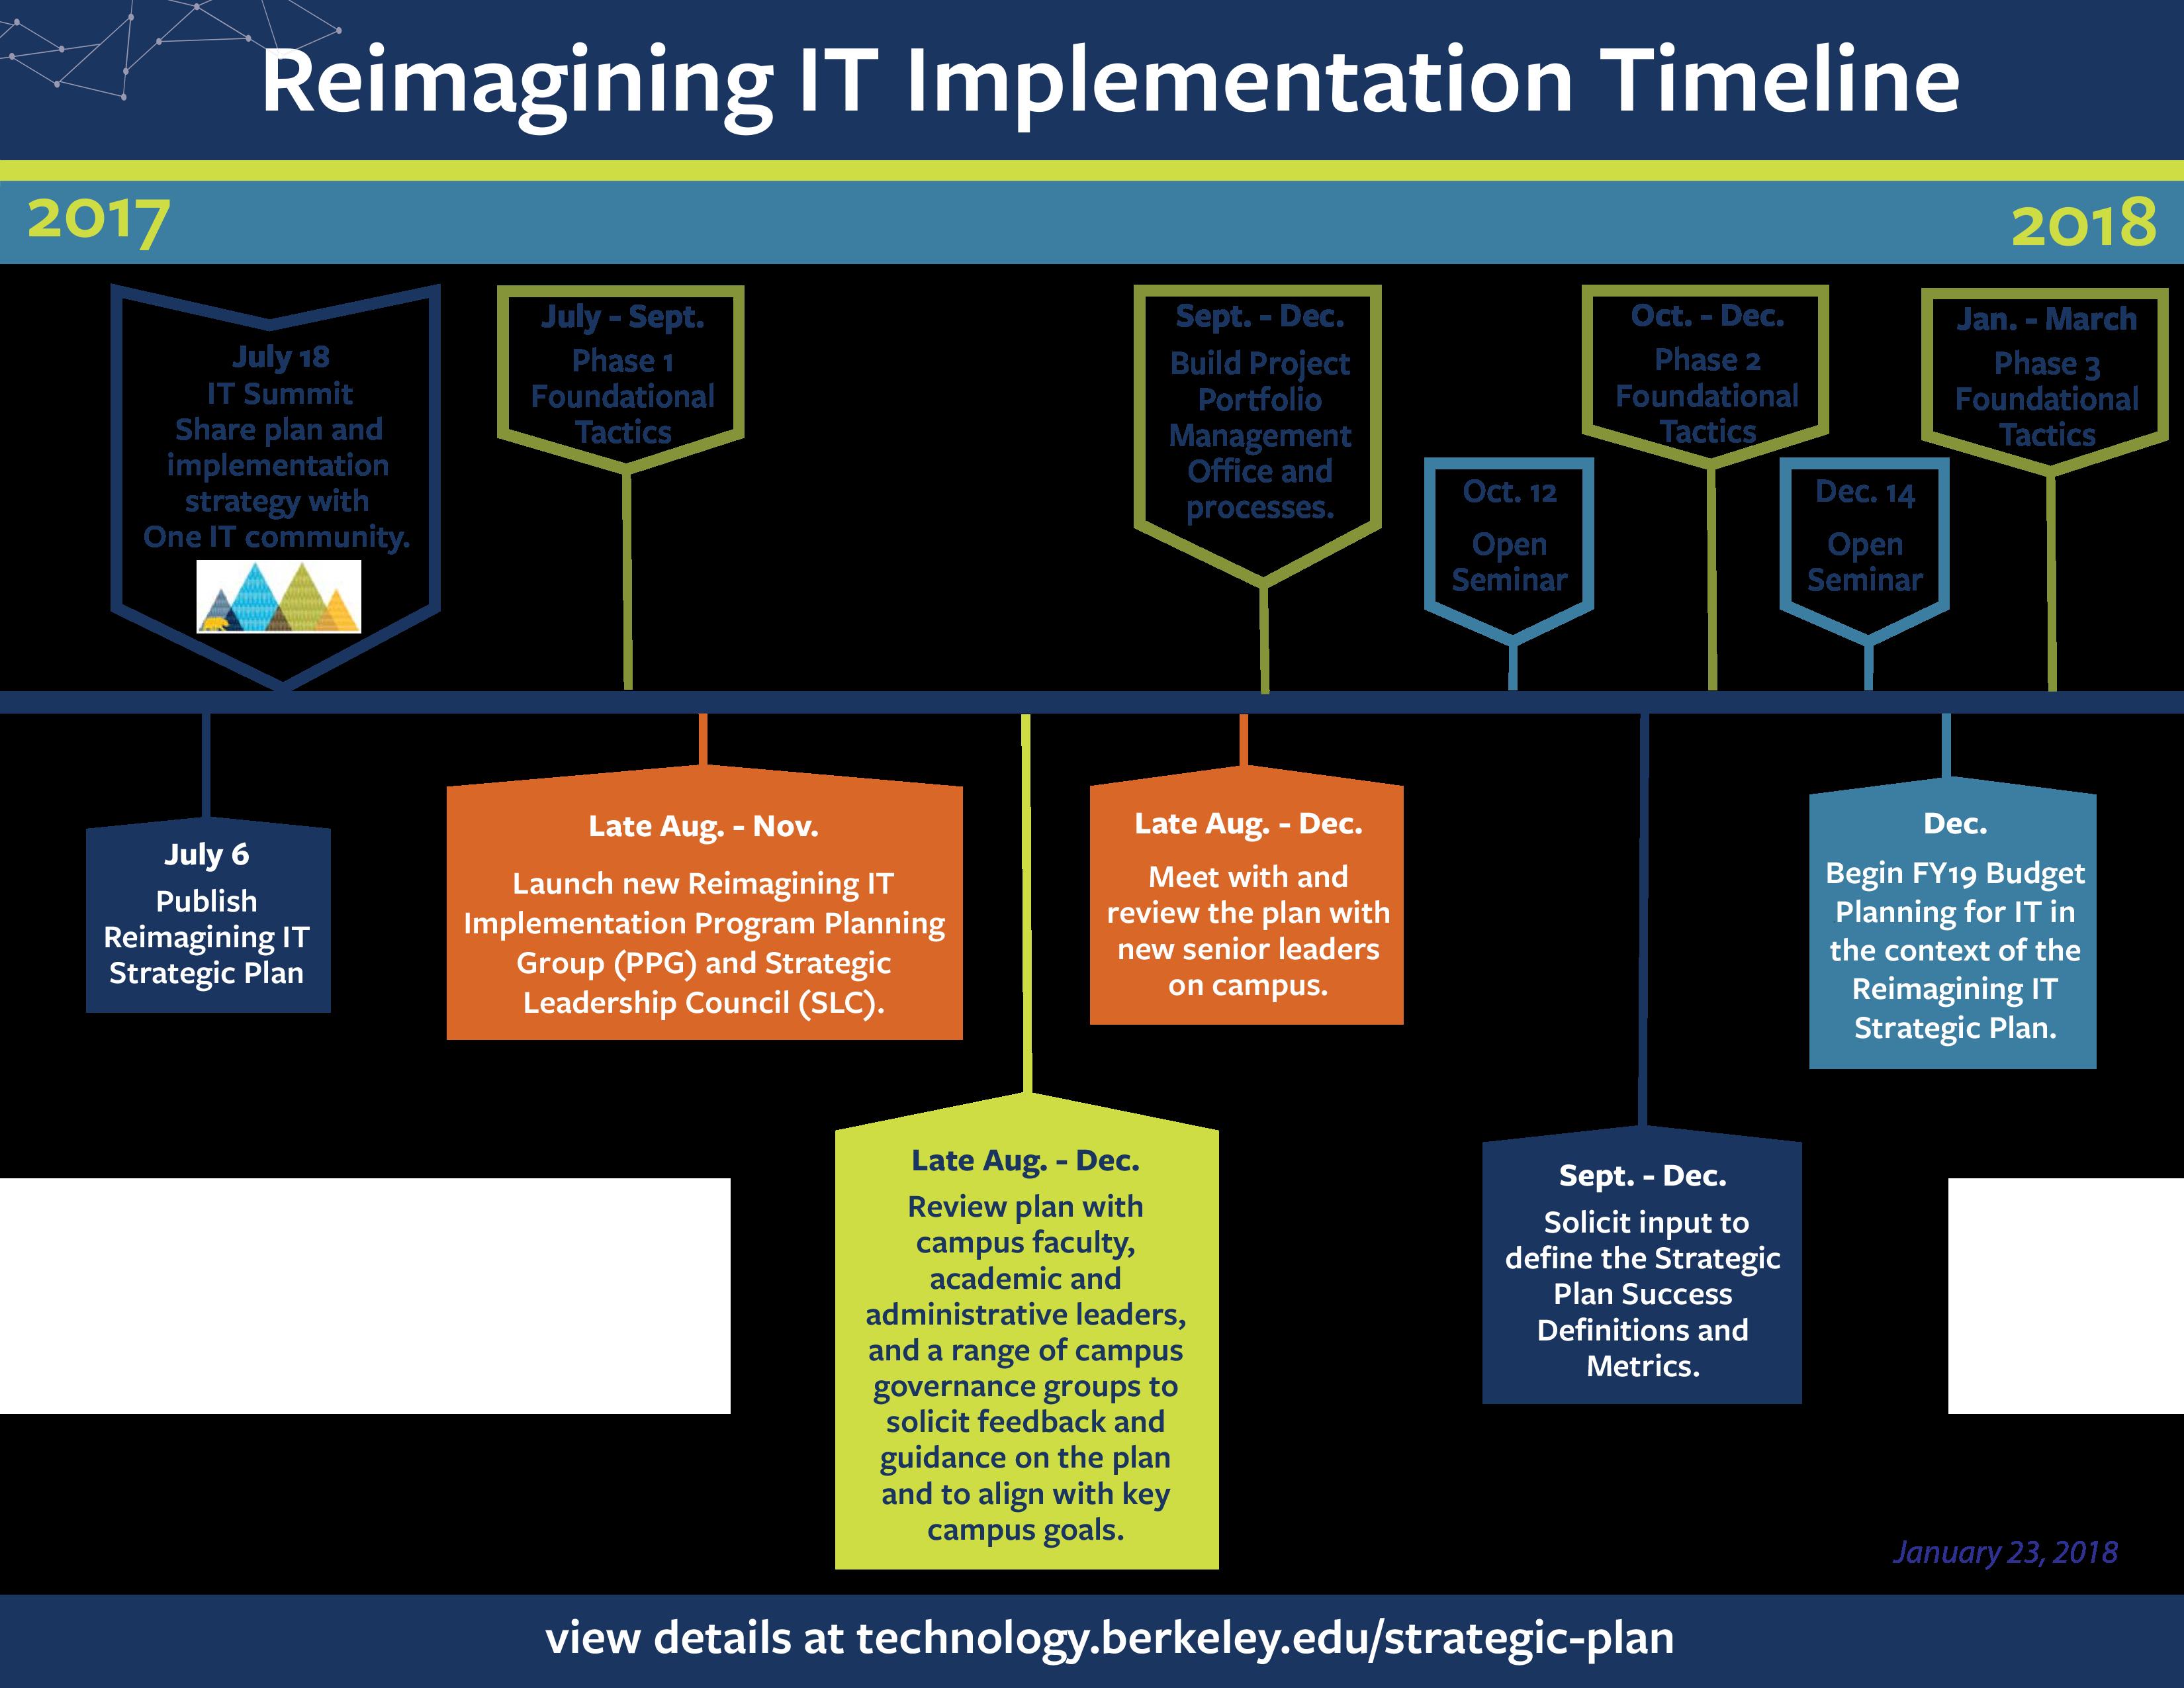 Re IT Implementation Timeline